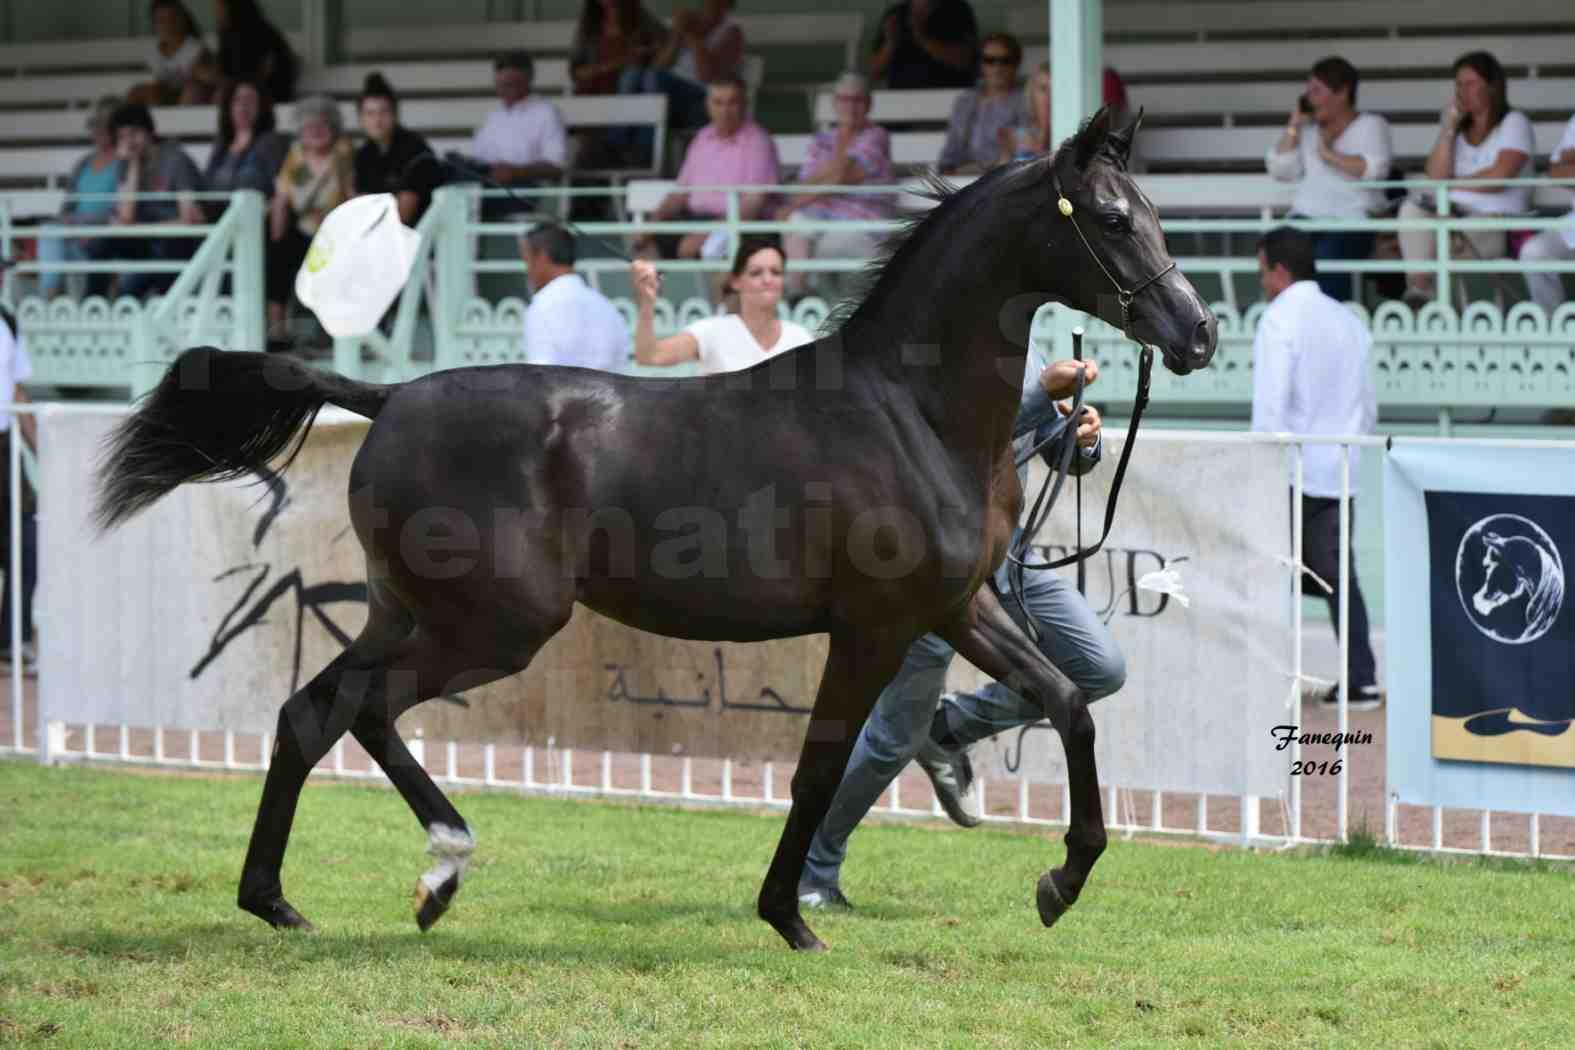 International Arabian Horse Show B de VICHY 2016 - ANNALISA ALIH - Notre Sélection - 6